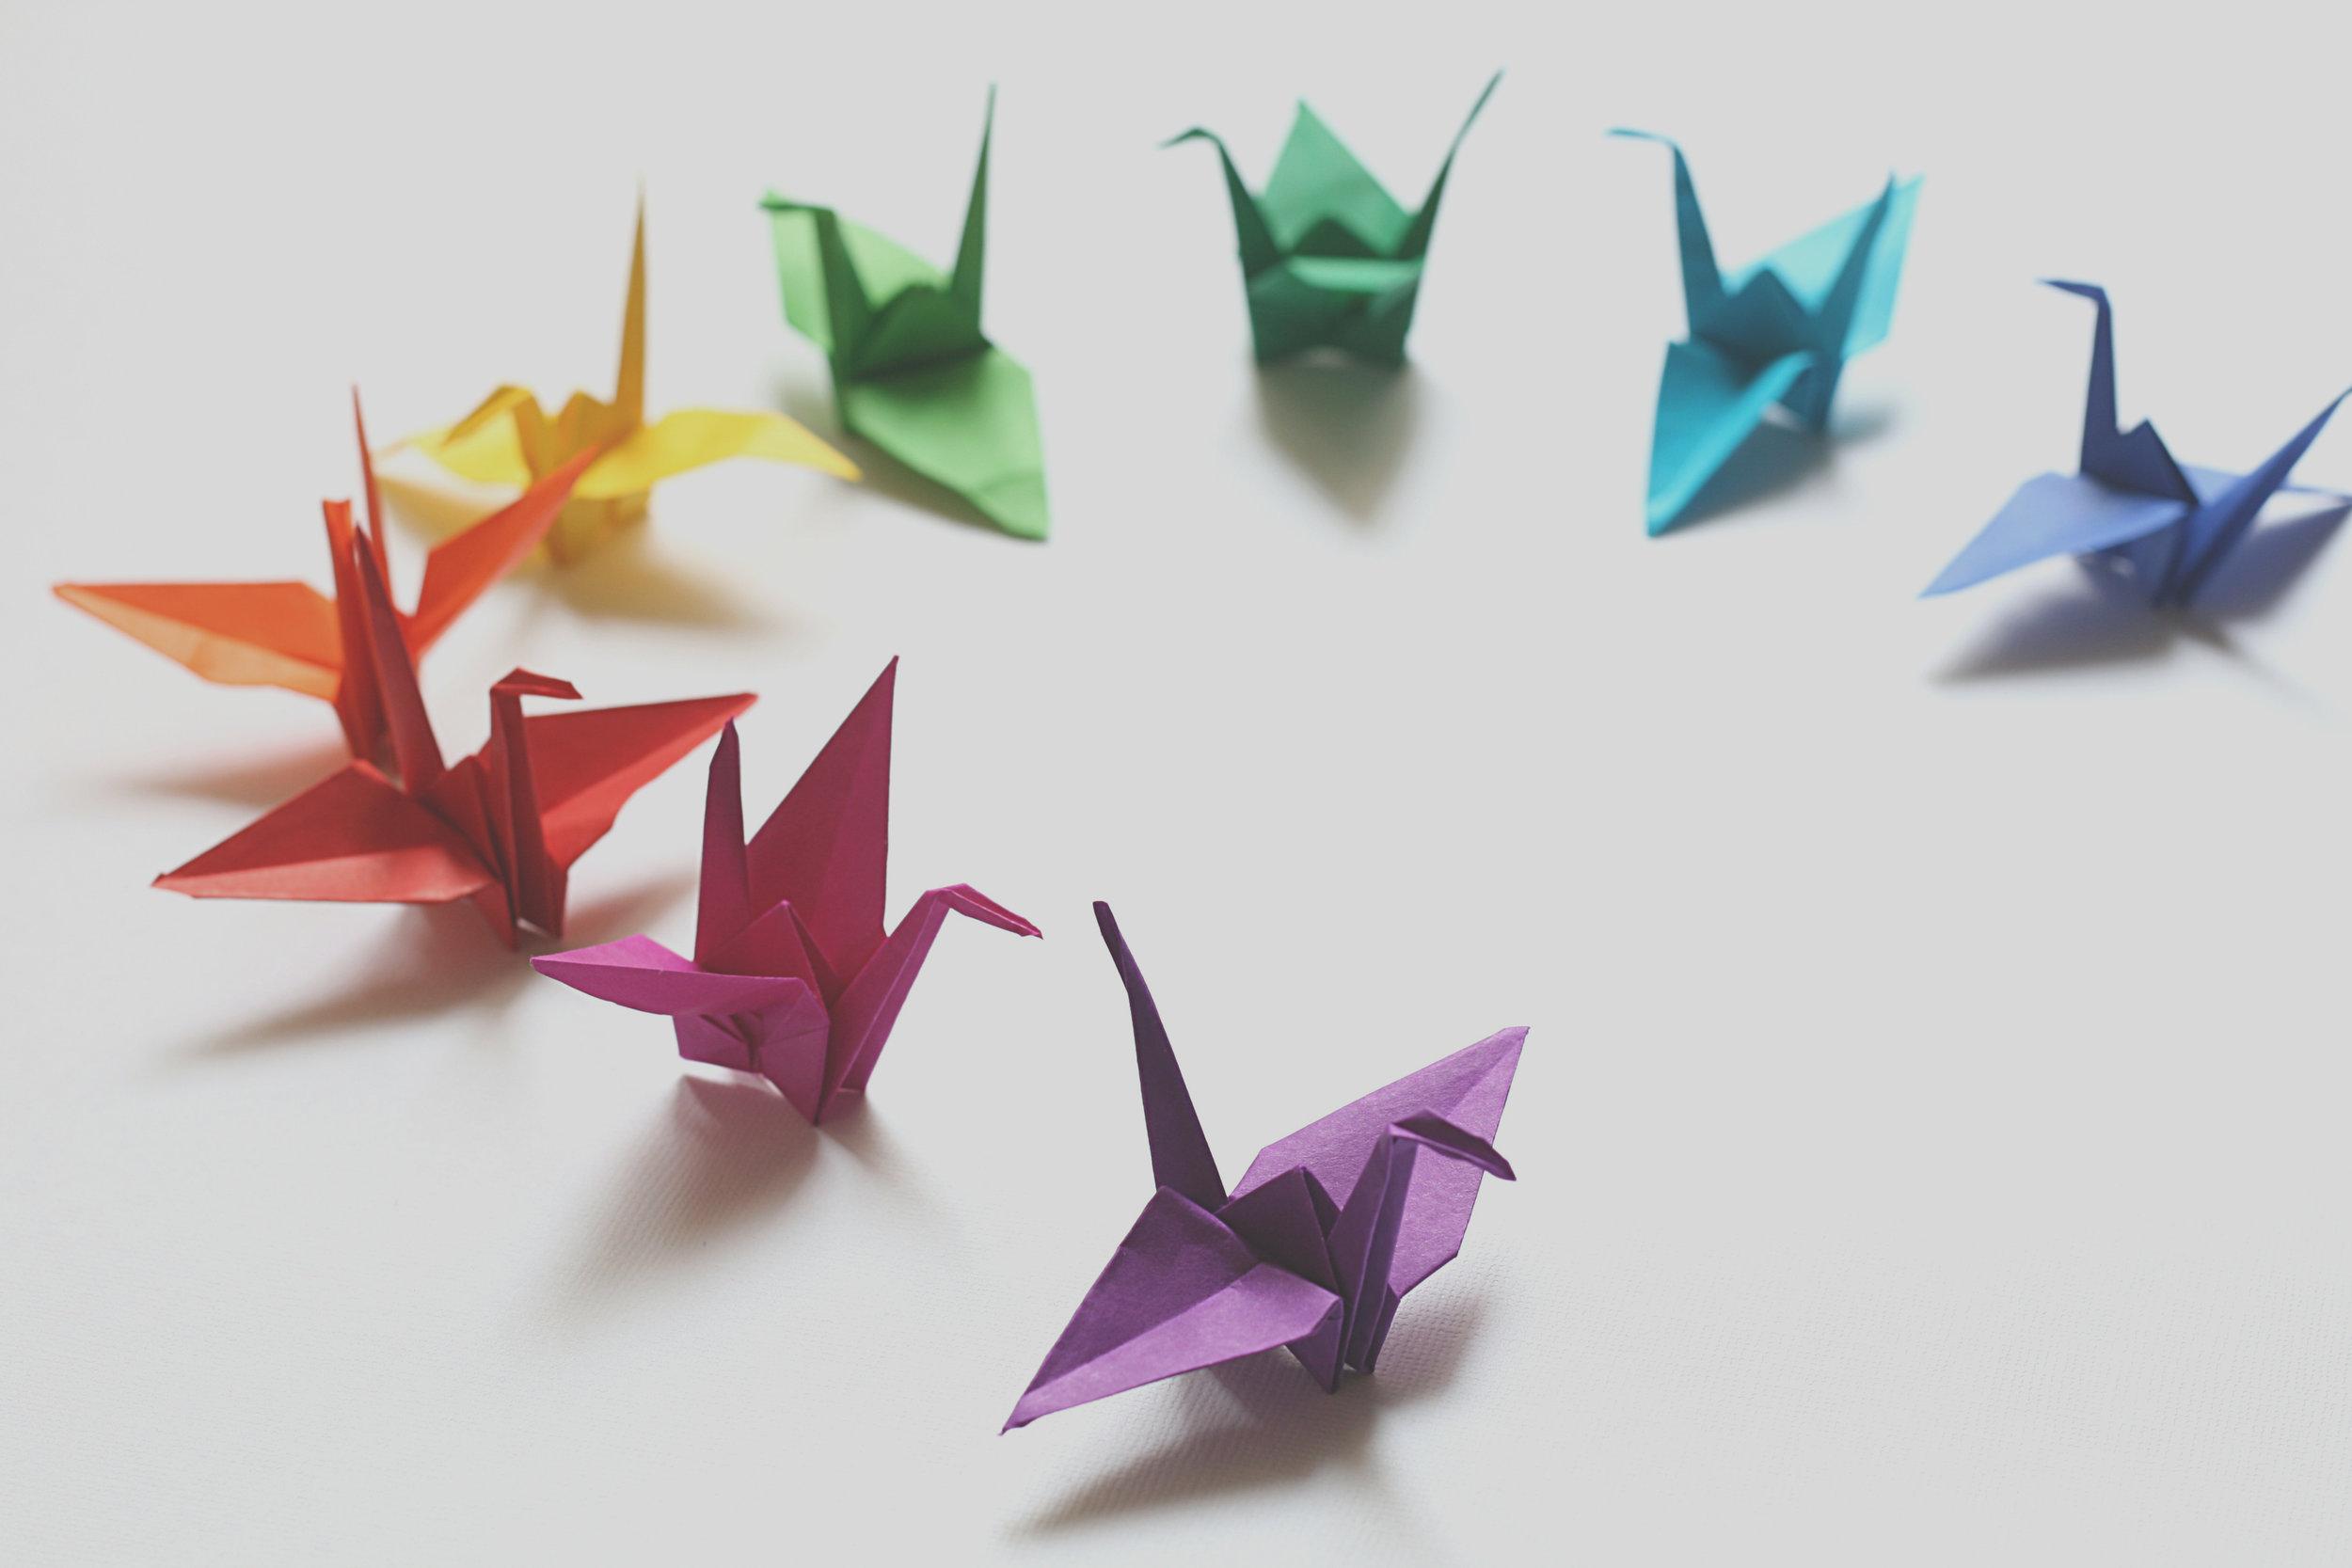 origami_AdobeStock_36886588_grey.jpeg